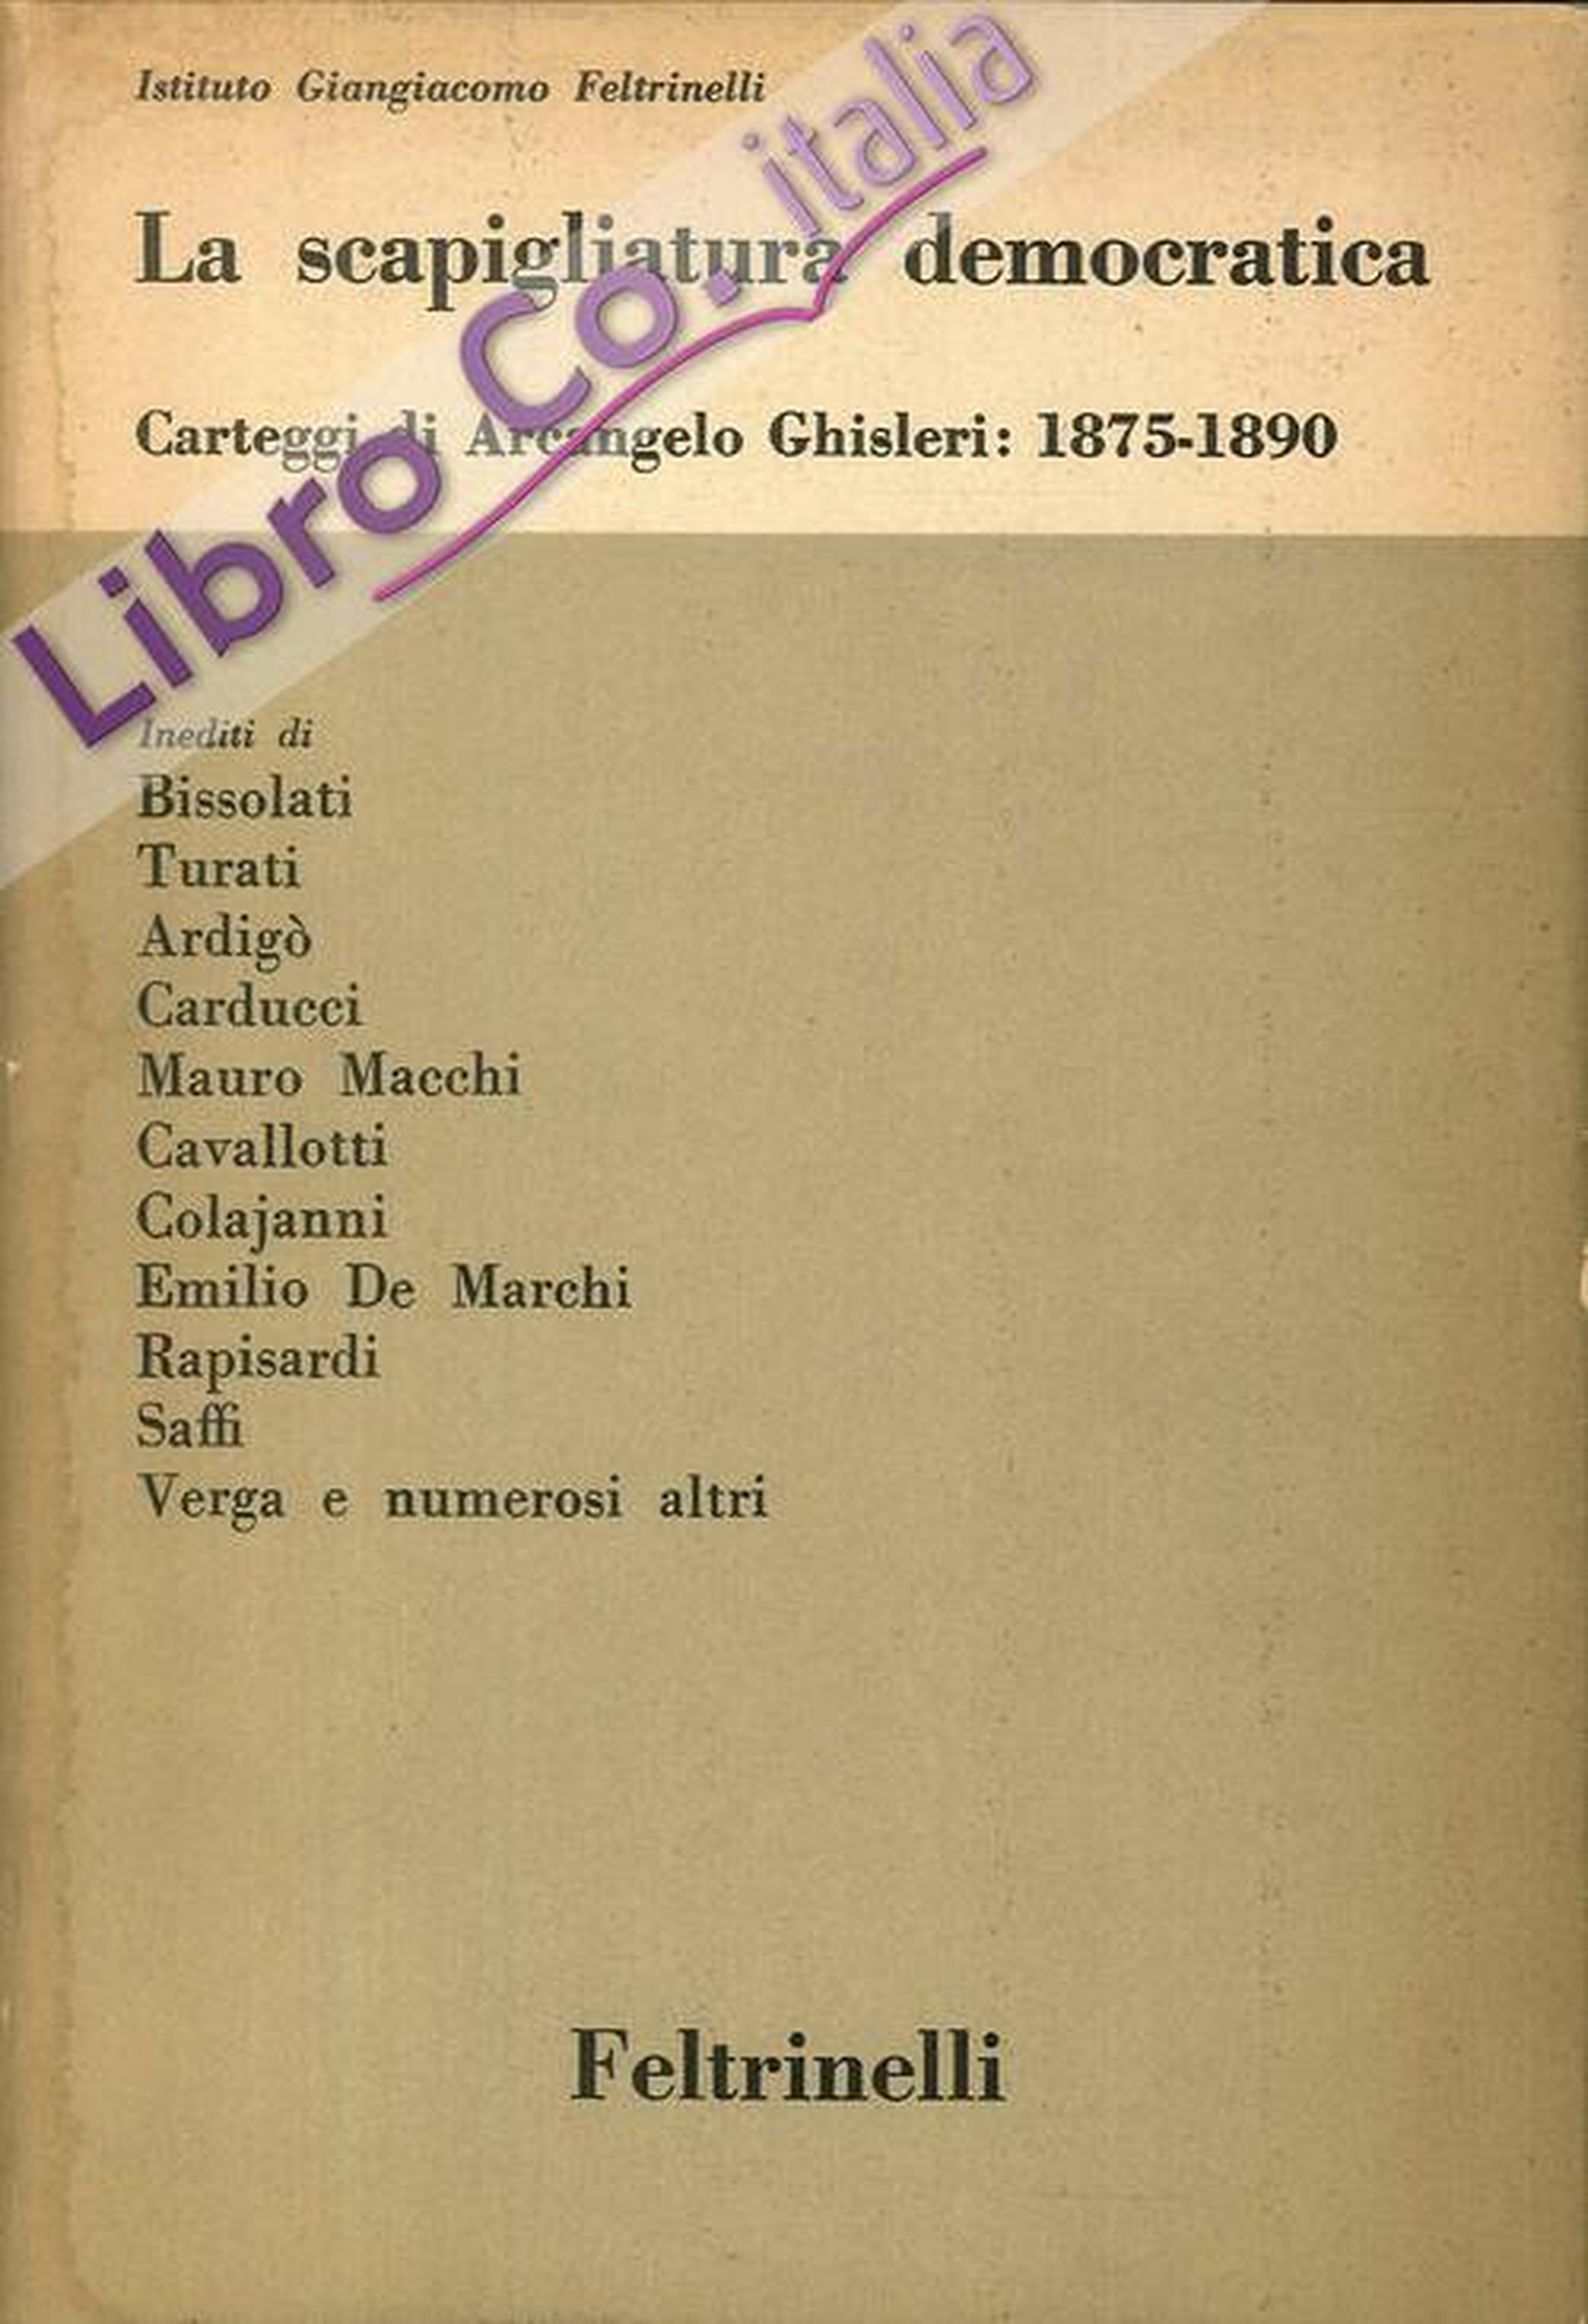 La Scapigliatura Democratica. Carteggio di Arcangelo Ghisleri: 1875-1890.